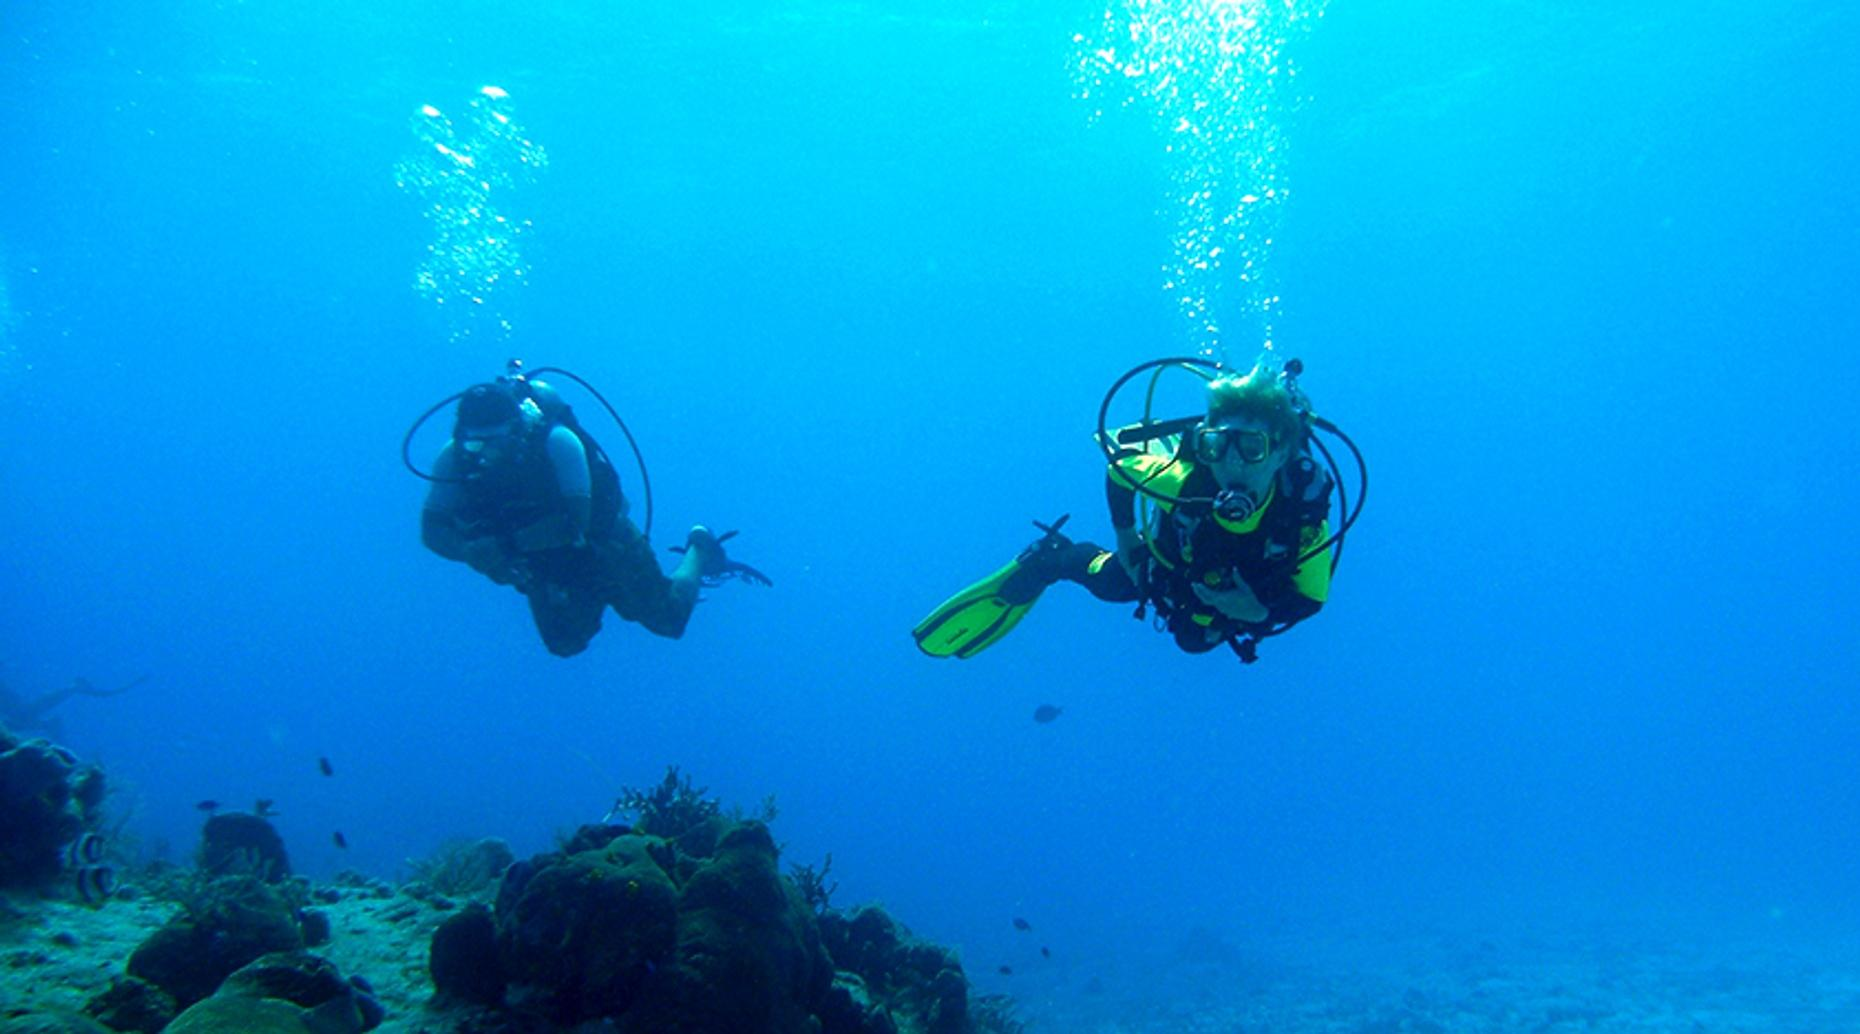 Scuba Diving Certification in San Francisco